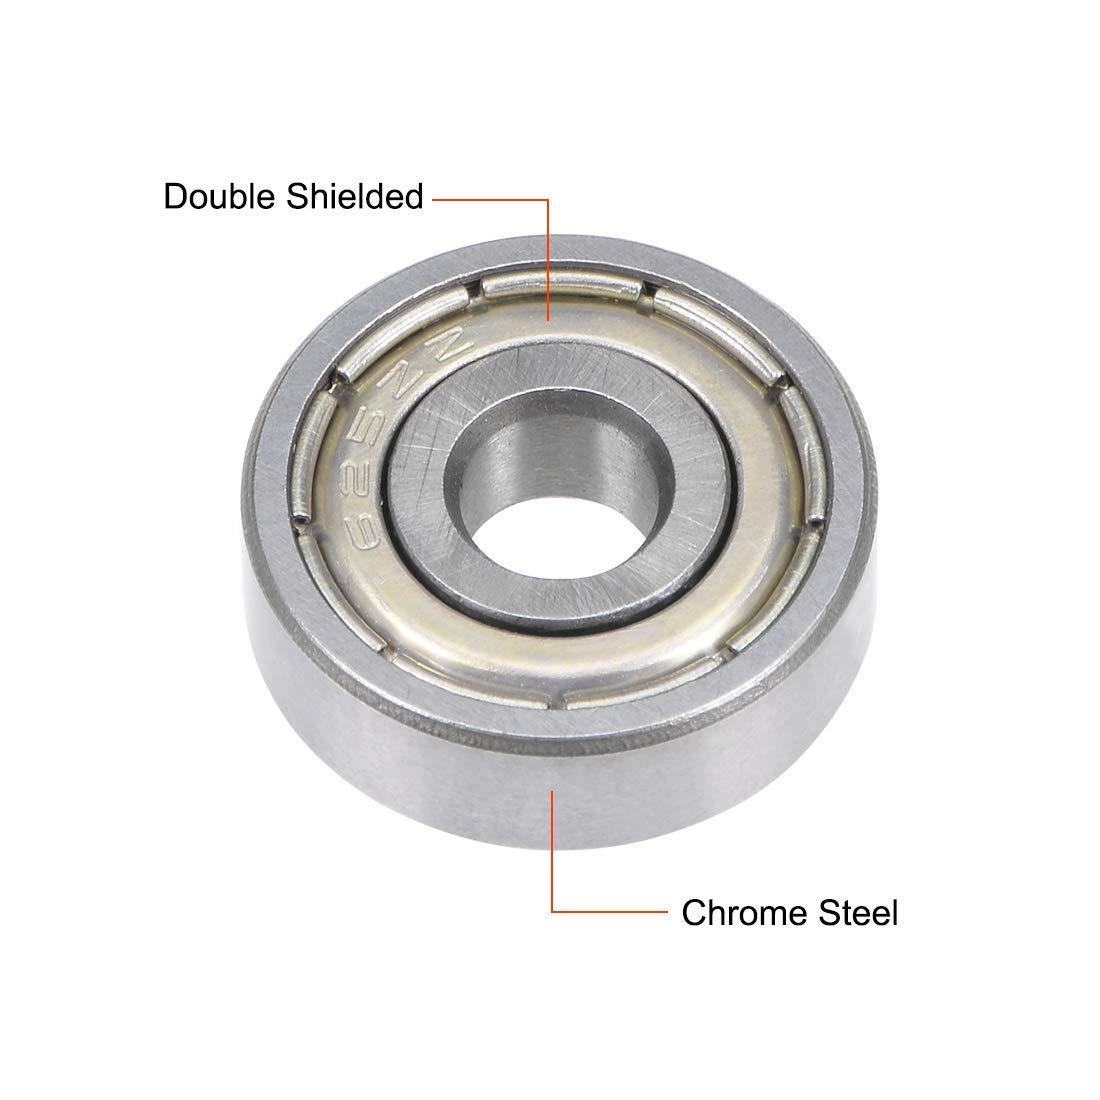 625ZZ Deep Groove Ball Bearings Double-Shielded Chrome Steel Bearings 5x16x5 mm Package of 5